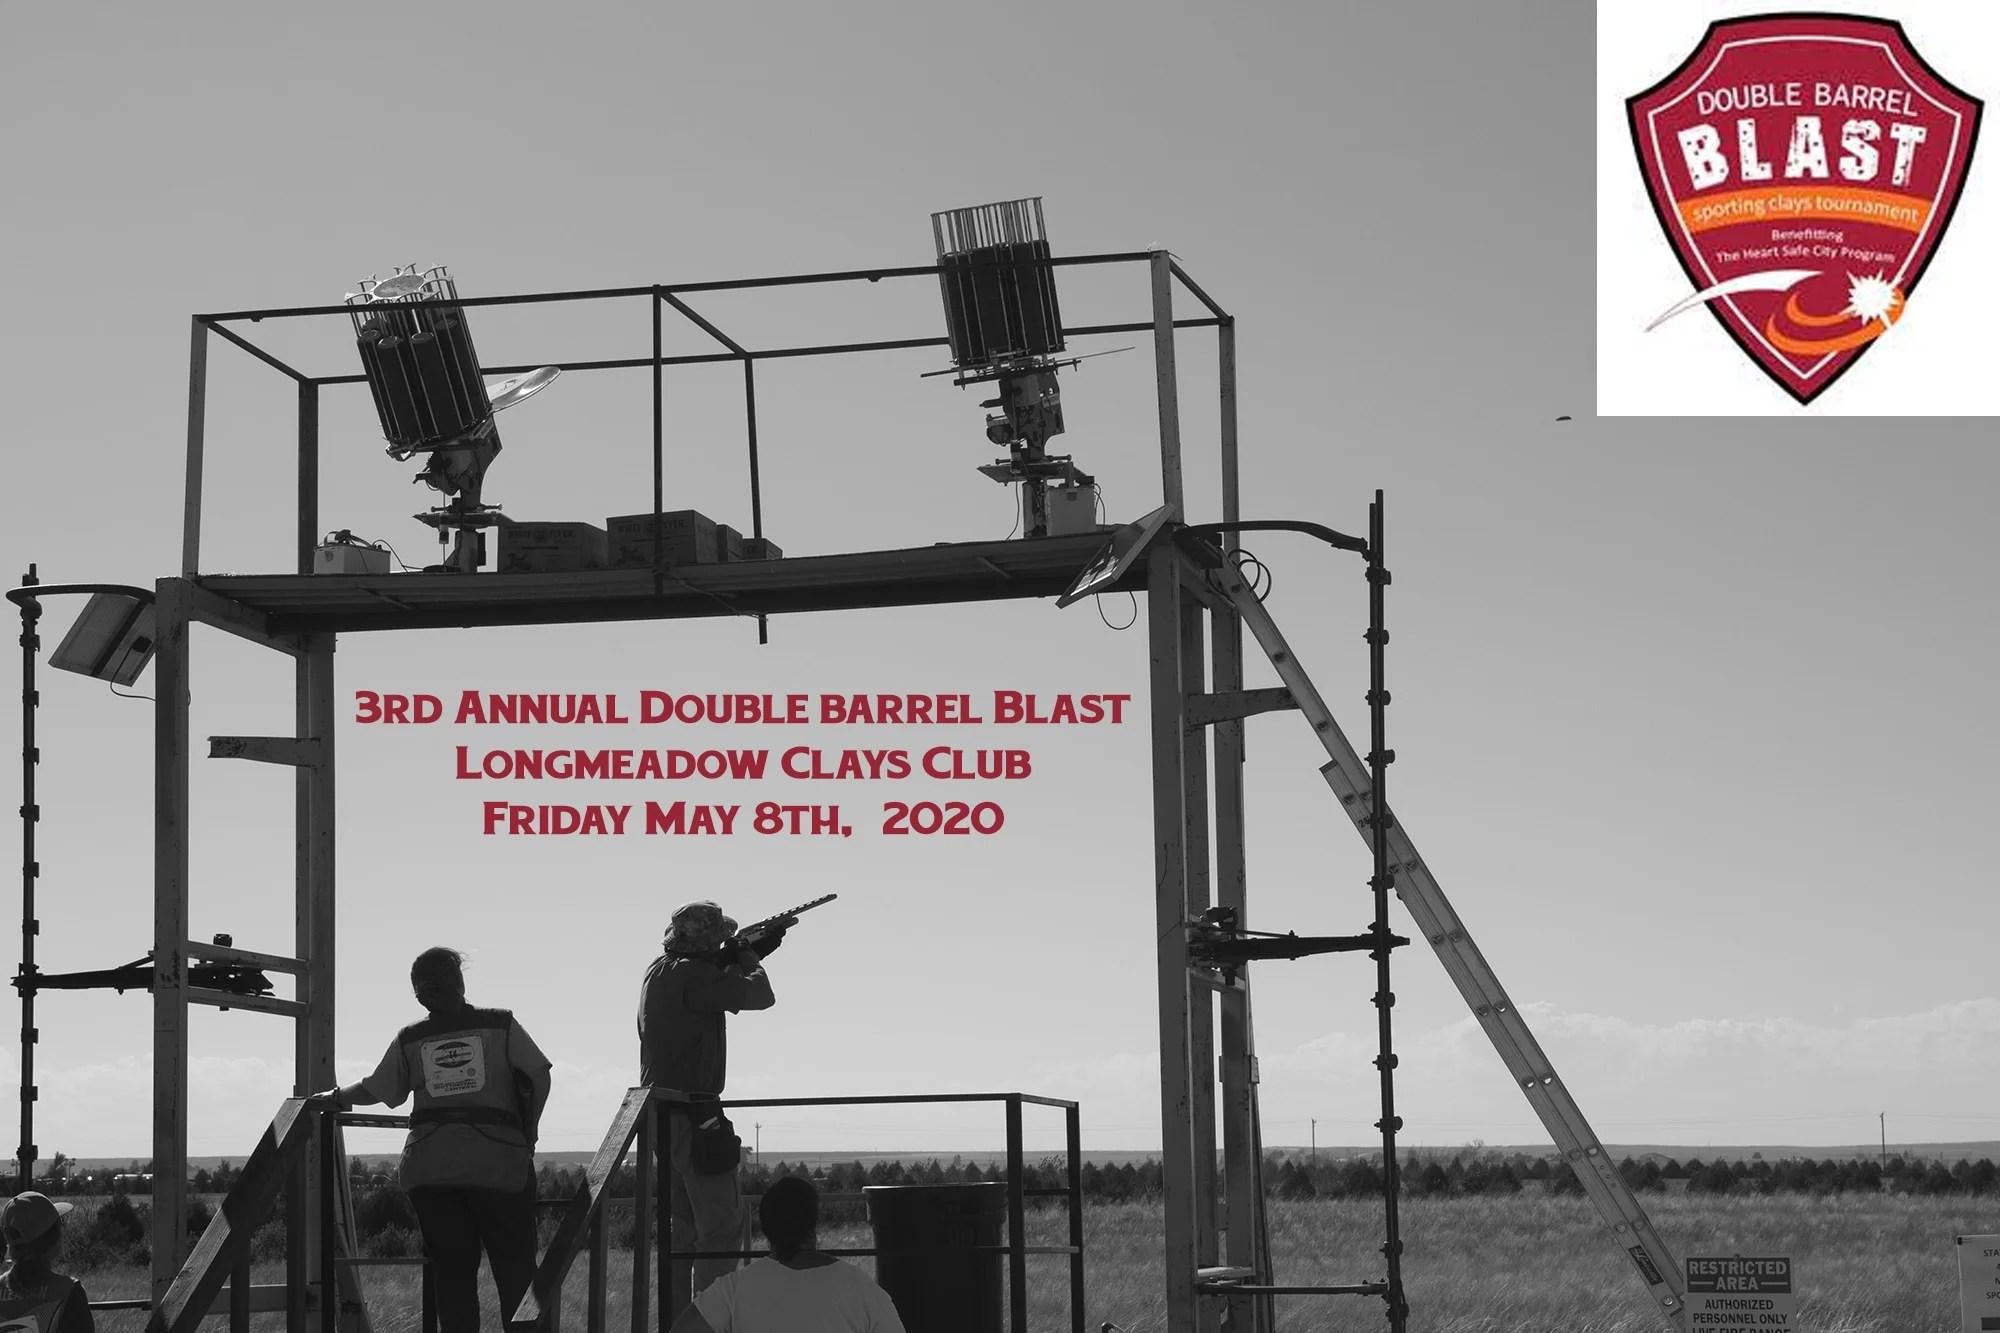 Double Barrel Blast 2020 Event Flyer